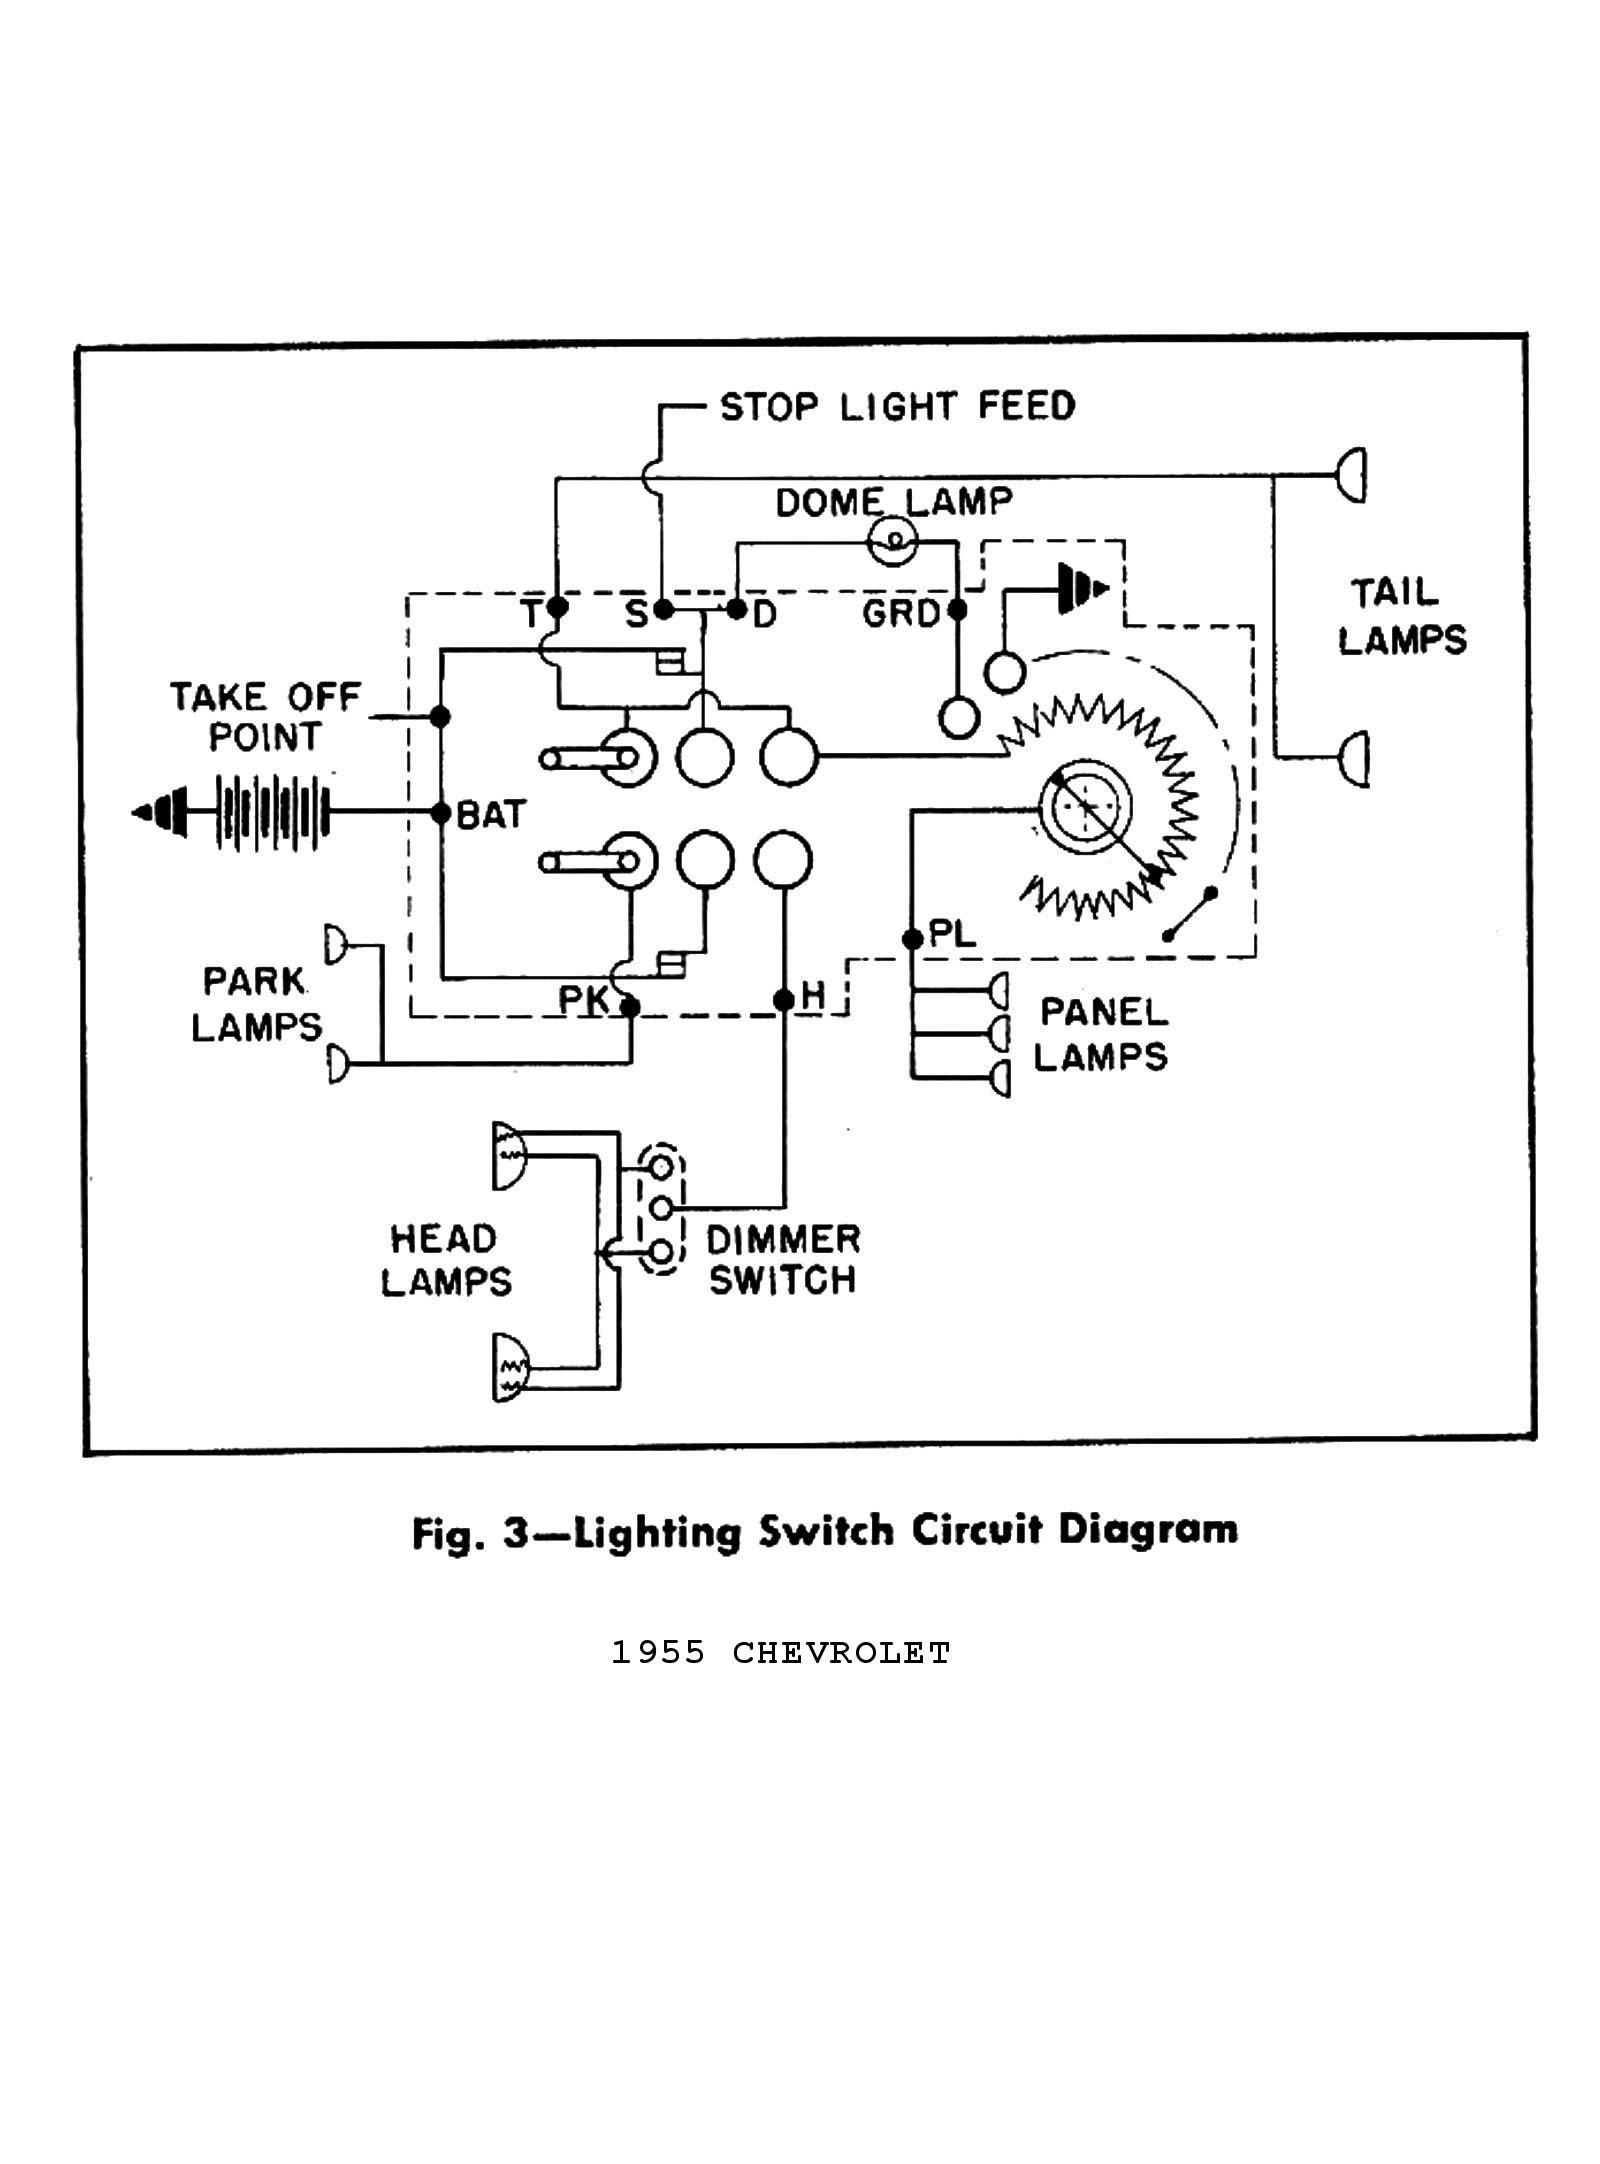 6 Terminal Ignition Switch Wiring : terminal, ignition, switch, wiring, Indak, Ignition, Switch, Wiring, Diagram